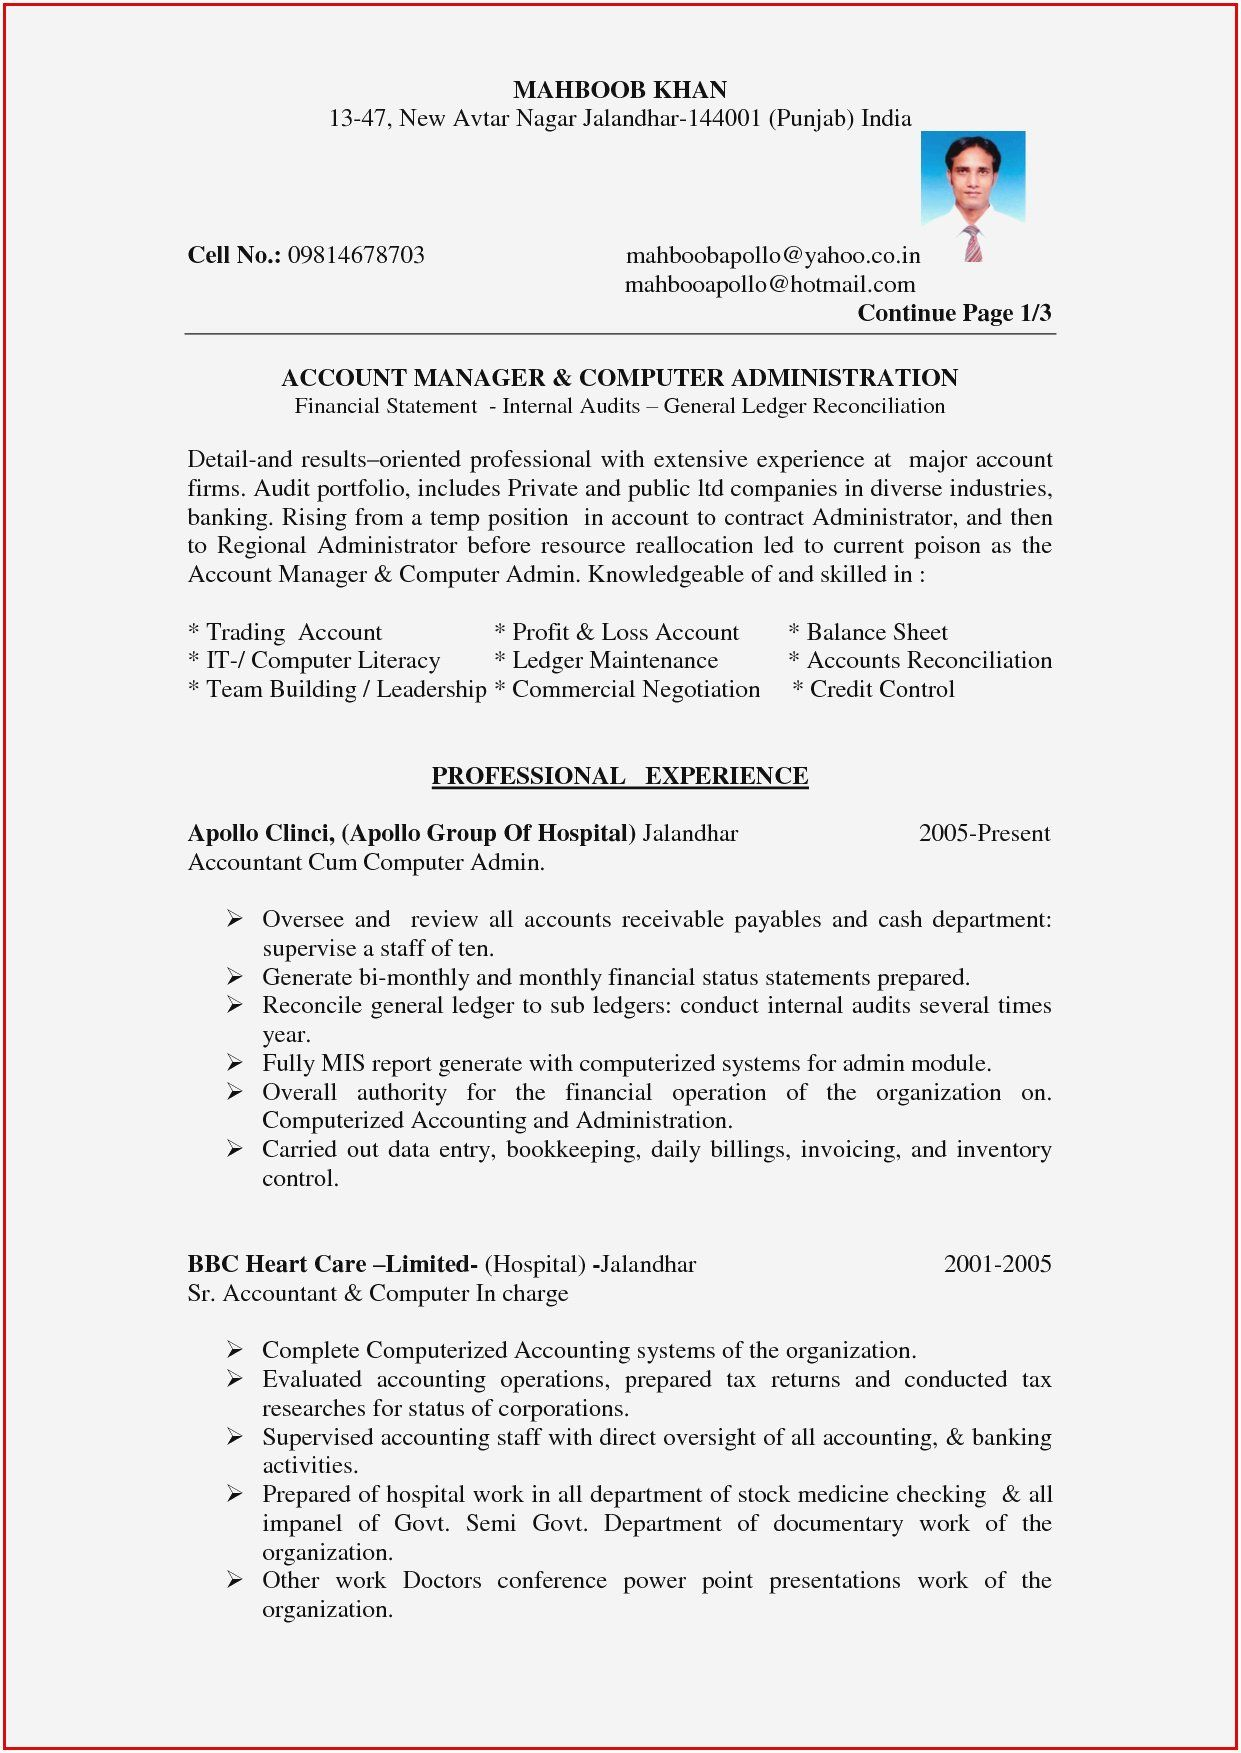 Junior Accountant Resume Sample Luxury Professional Cv For Accountant Pdf Resume Resume Sample Resume Format In Word Accounting Jobs Accountant Resume